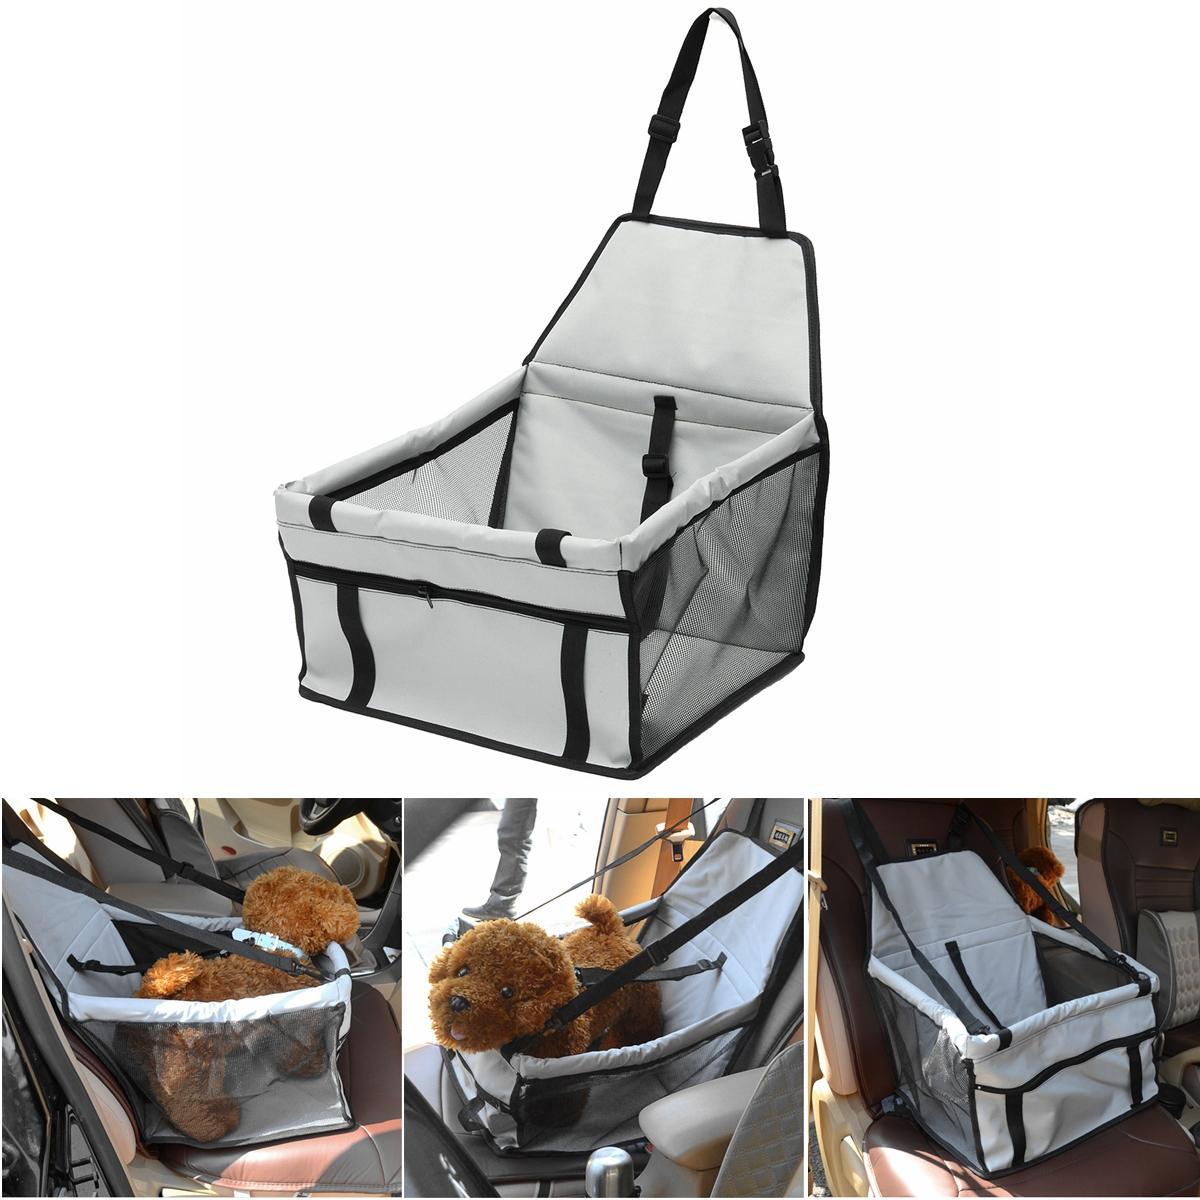 "15.7""×13.8""×9.8"" Portable outdoor sleeping bag Folding Pet Car Seat Dog Cat Small Animal Safe Travel Carrier Kennel Puppy Handbag Sided Bag"